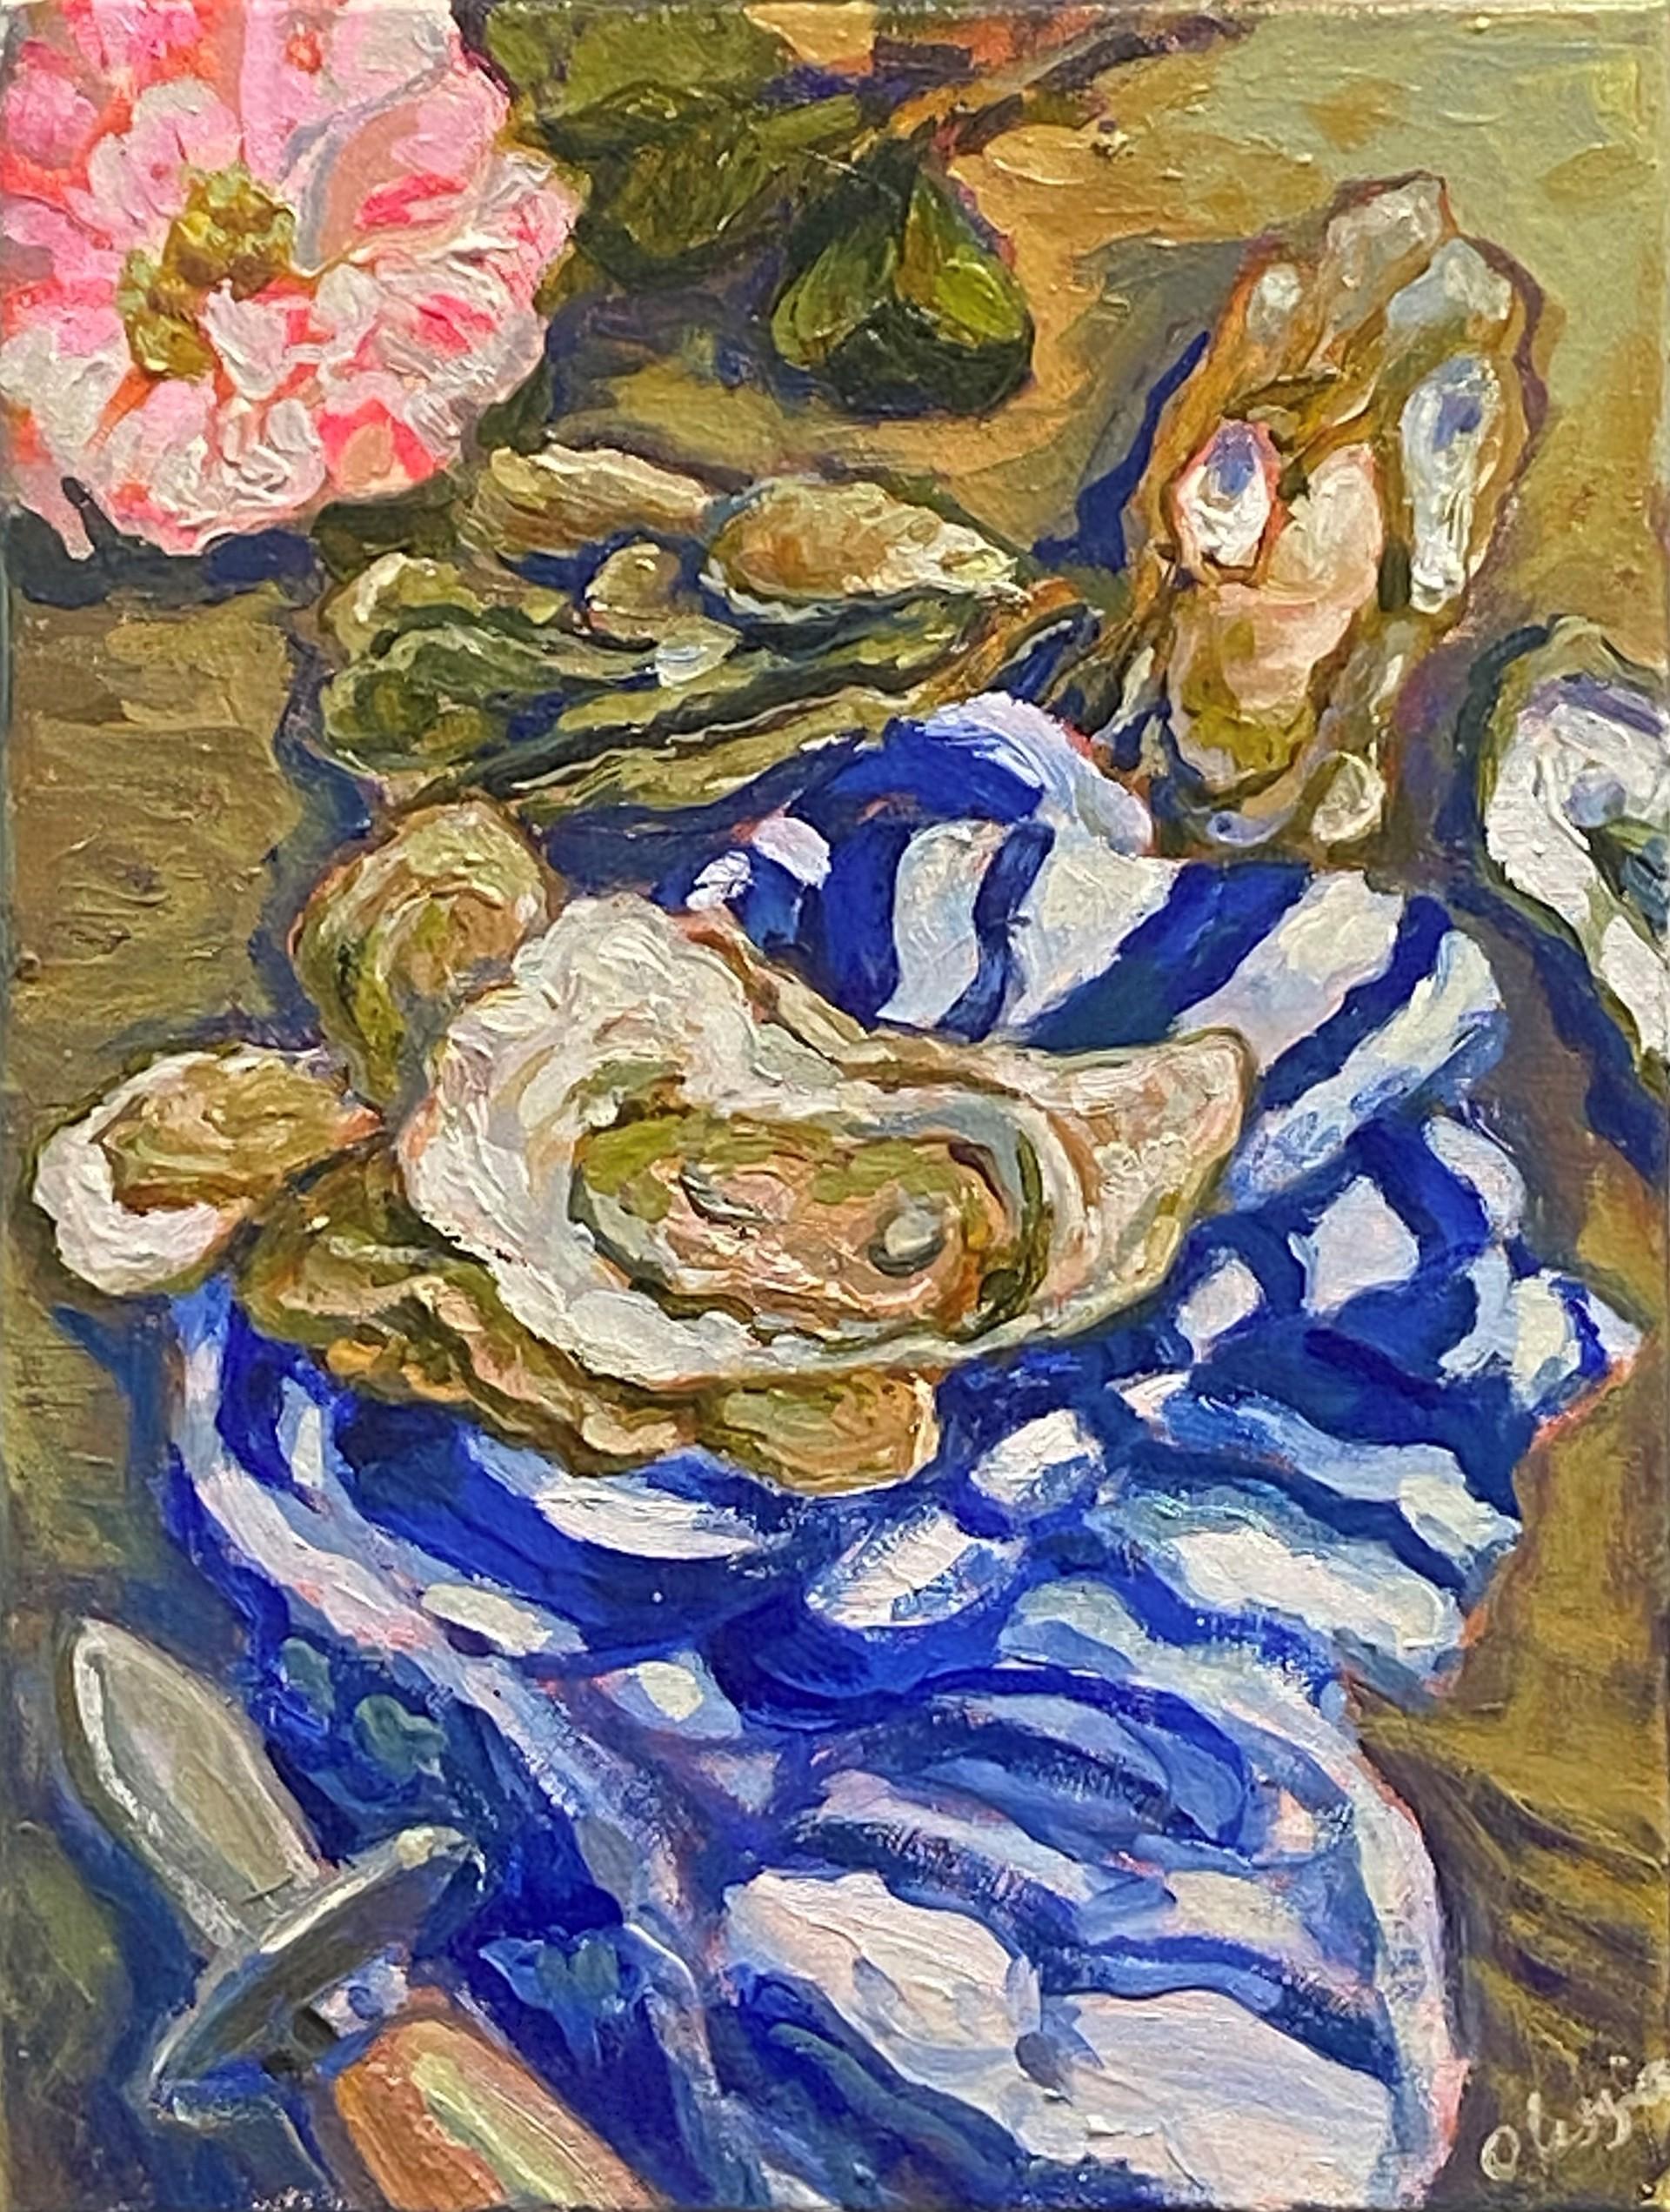 Sonoma Oyster Roast by Olessia Maximenko